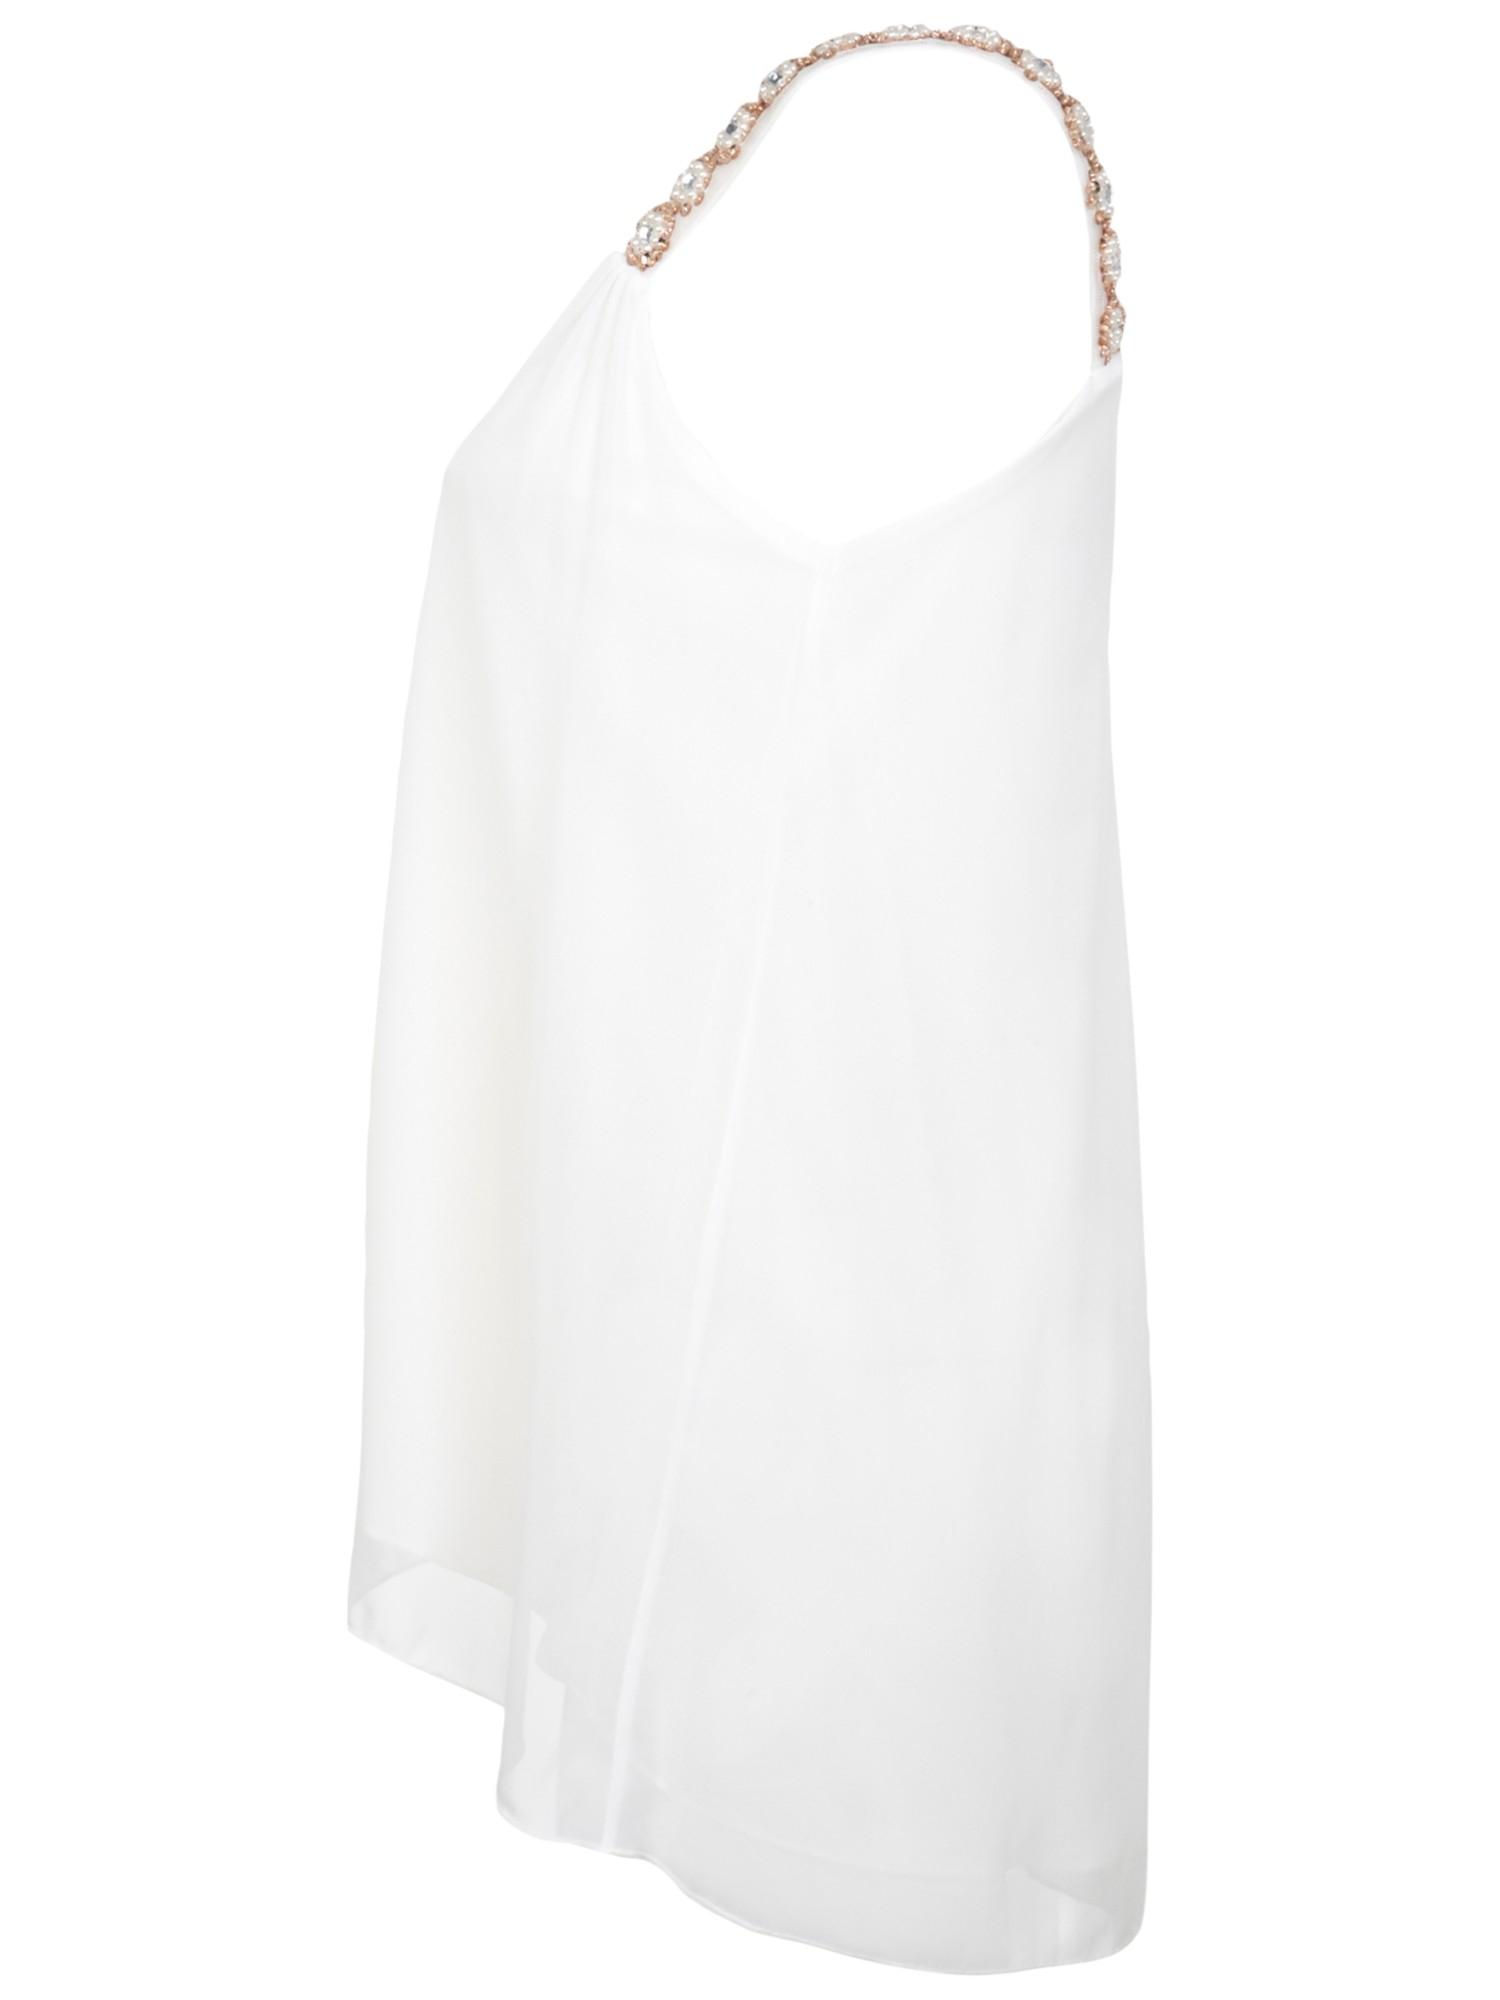 4219bcda541cf Miss Selfridge Embellished Strap Cami Top in Natural - Lyst